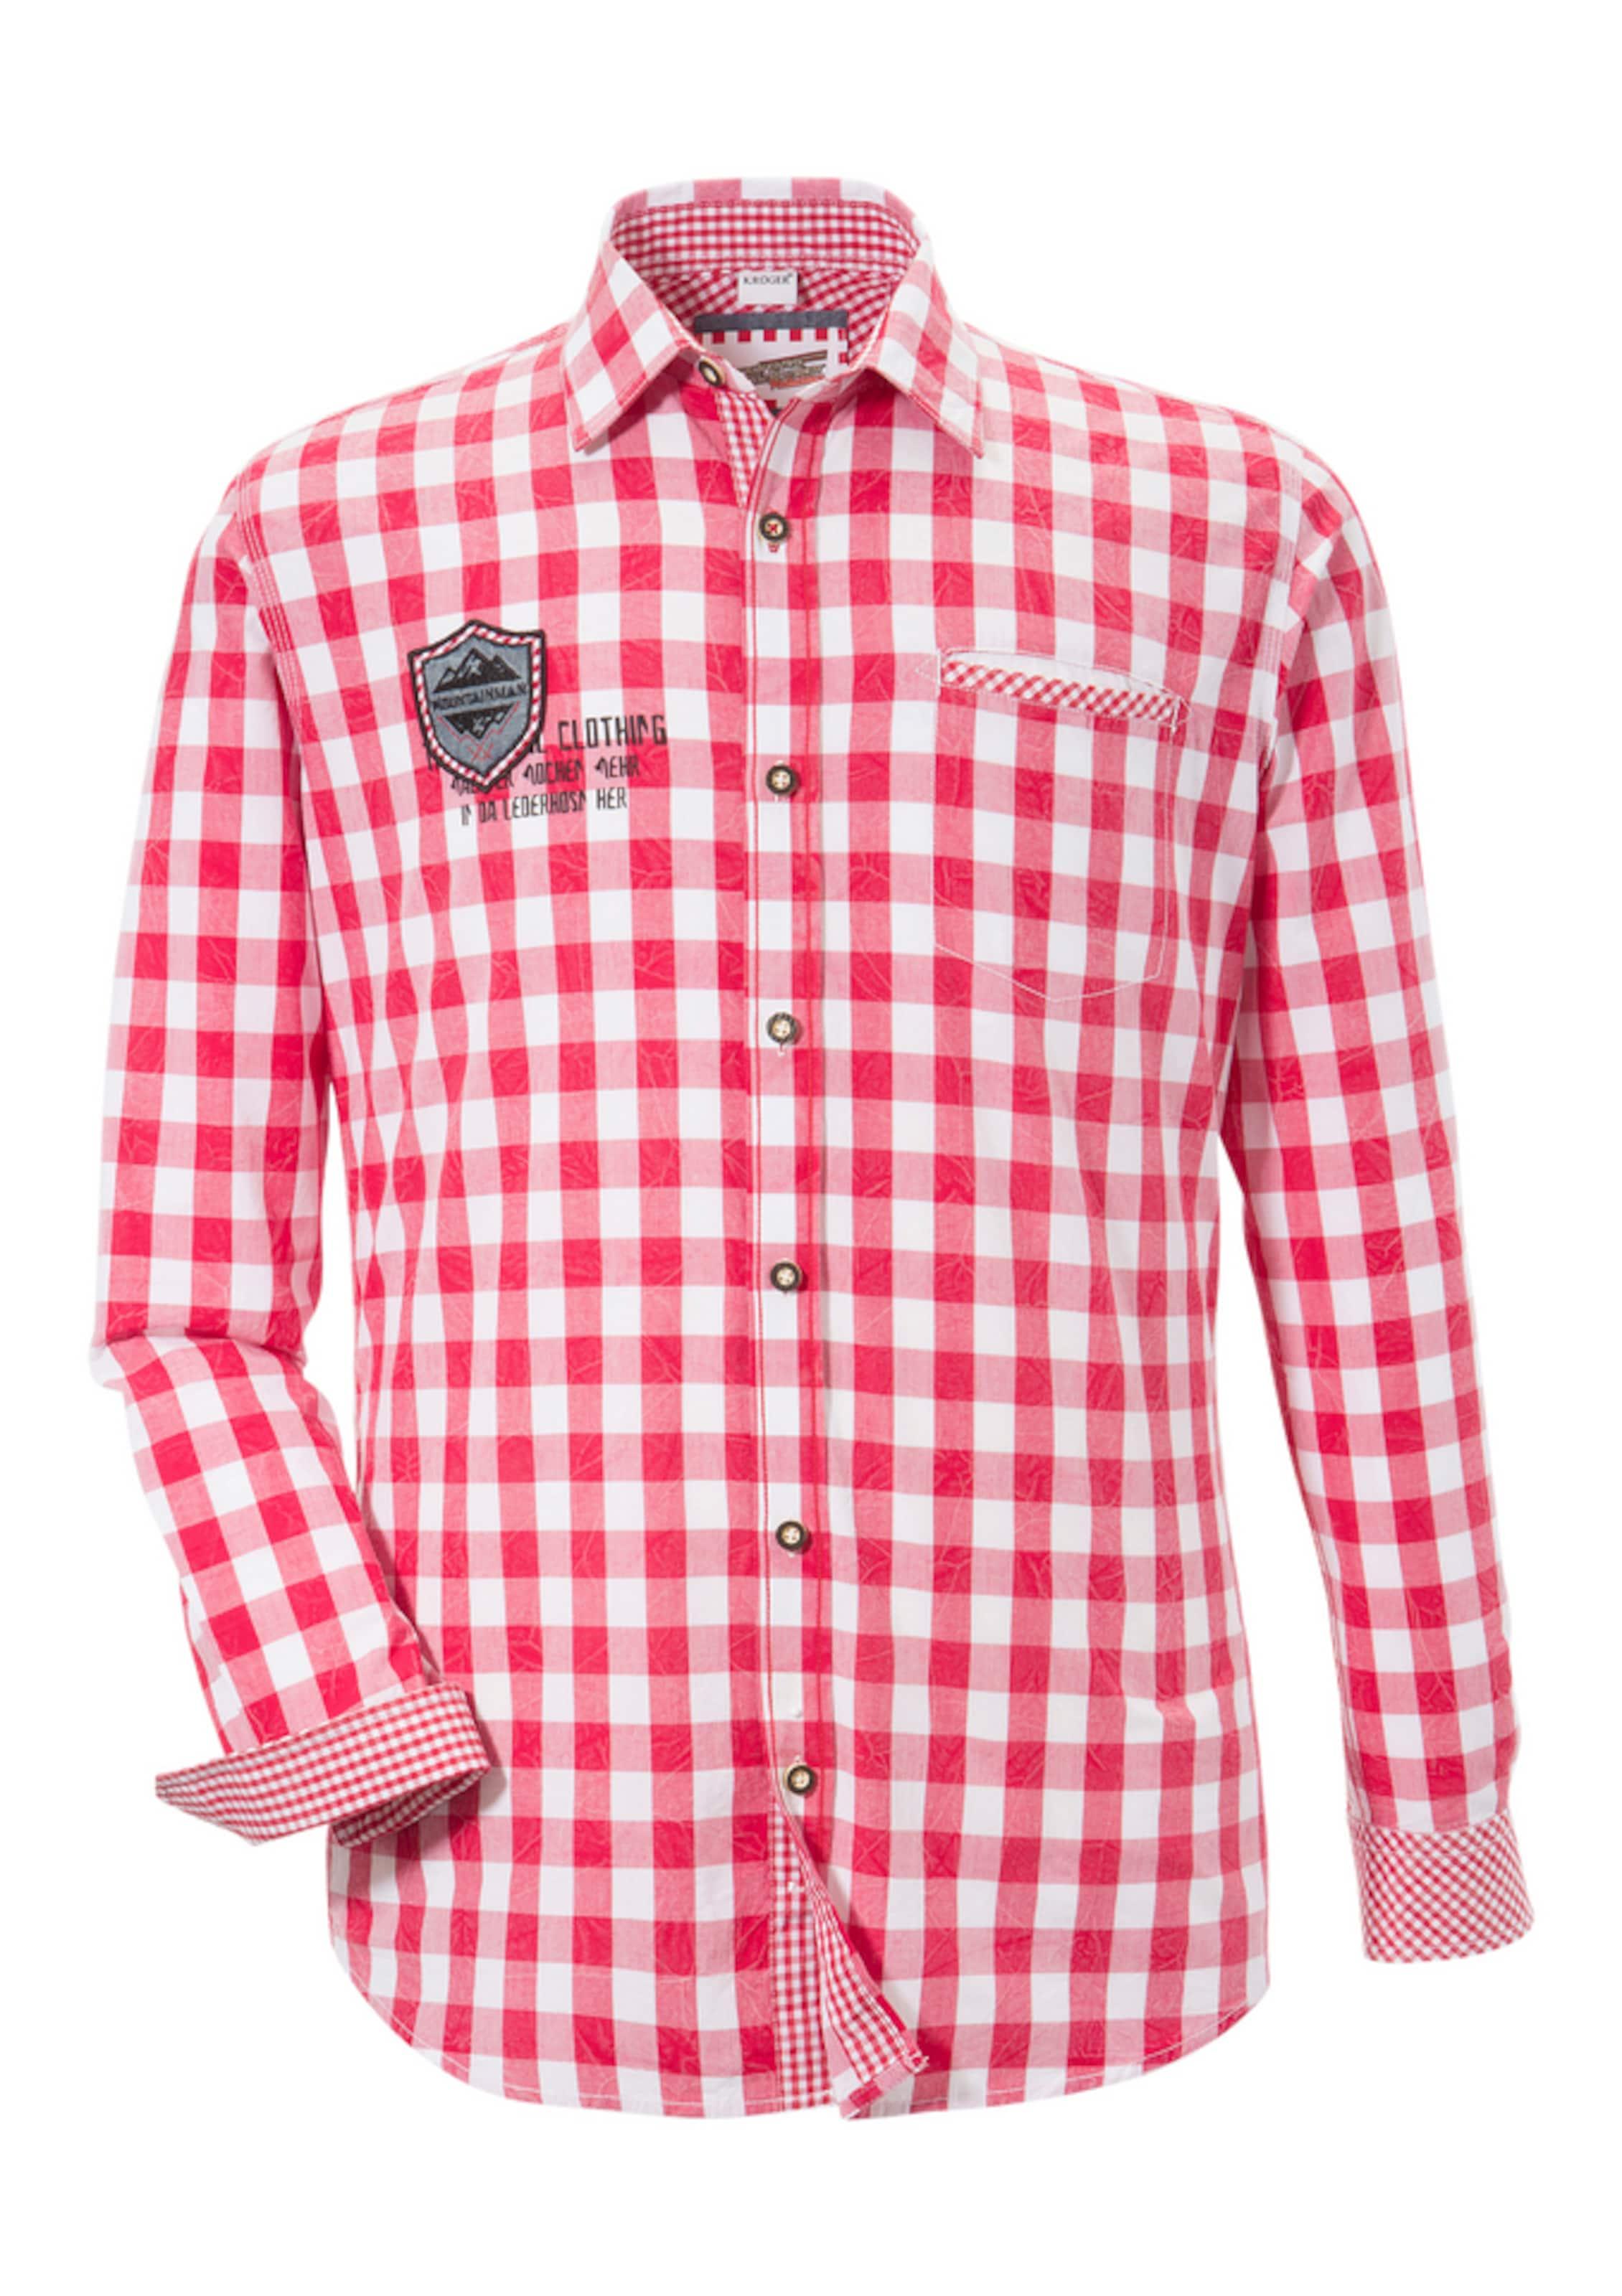 Herren Andreas Gabalier Kollektion Trachtenhemd blau, rot,  weiß | 04061468142219